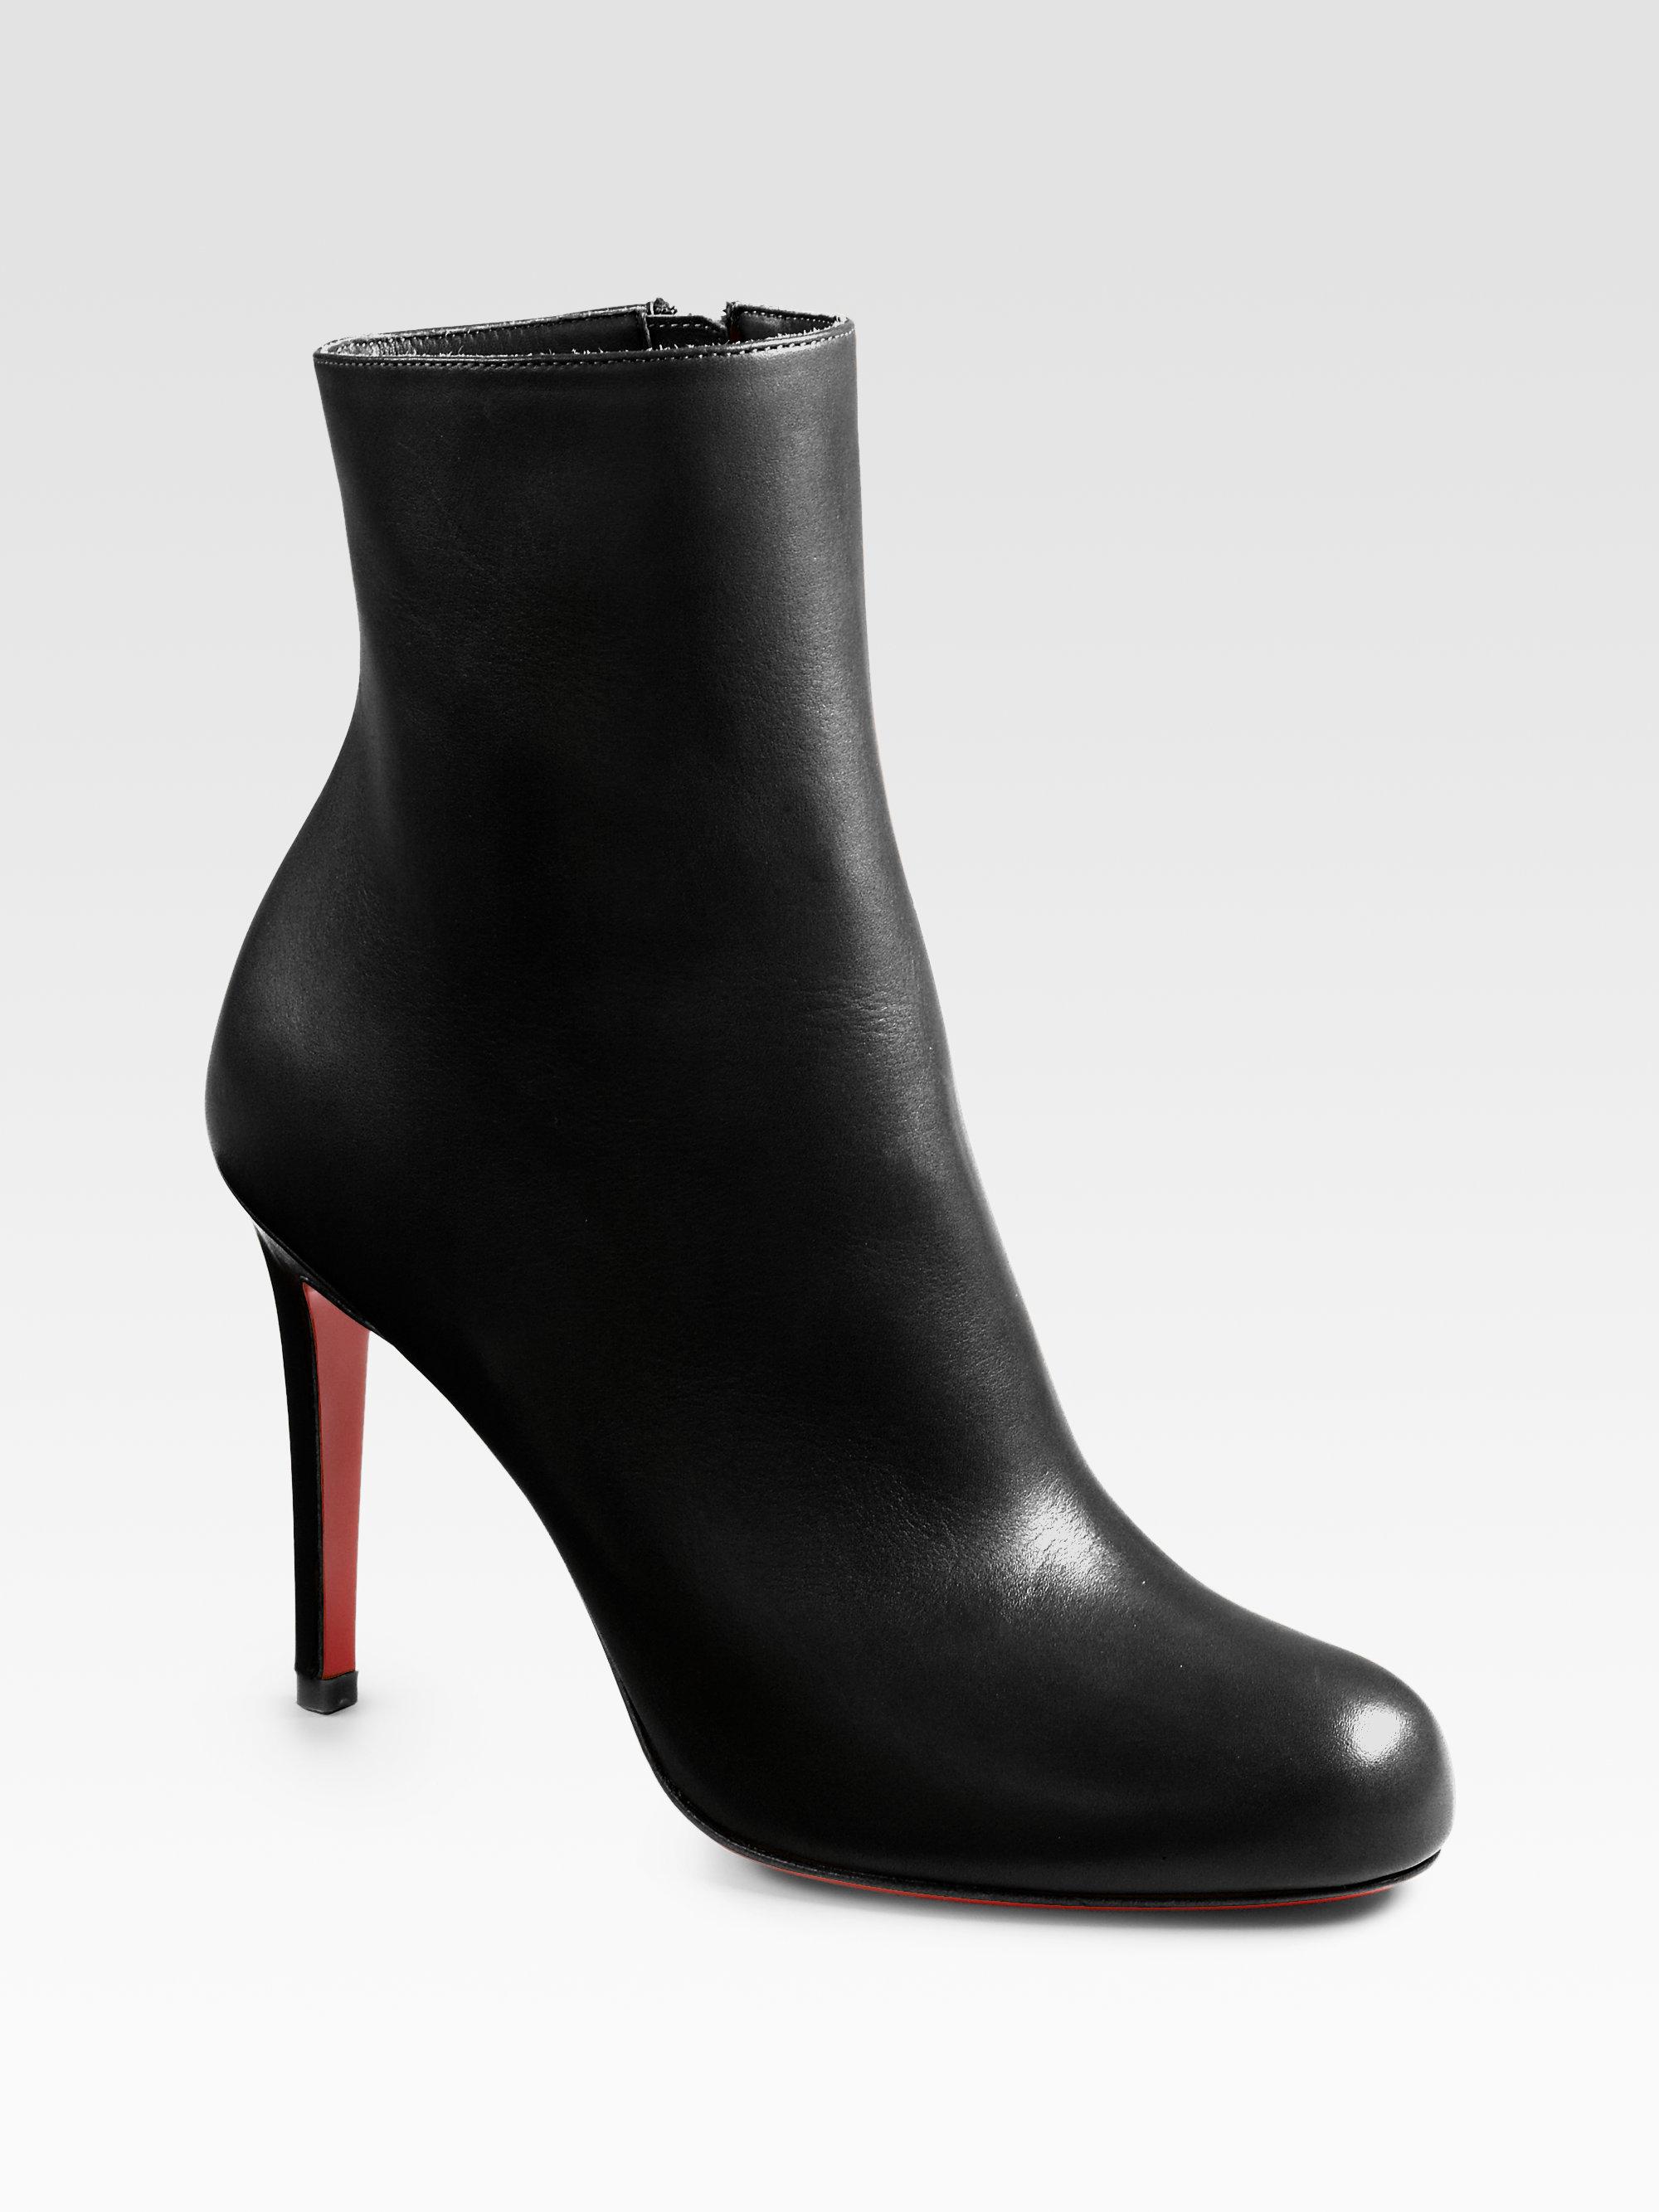 Ballerinas Shoes Mango Small Heels